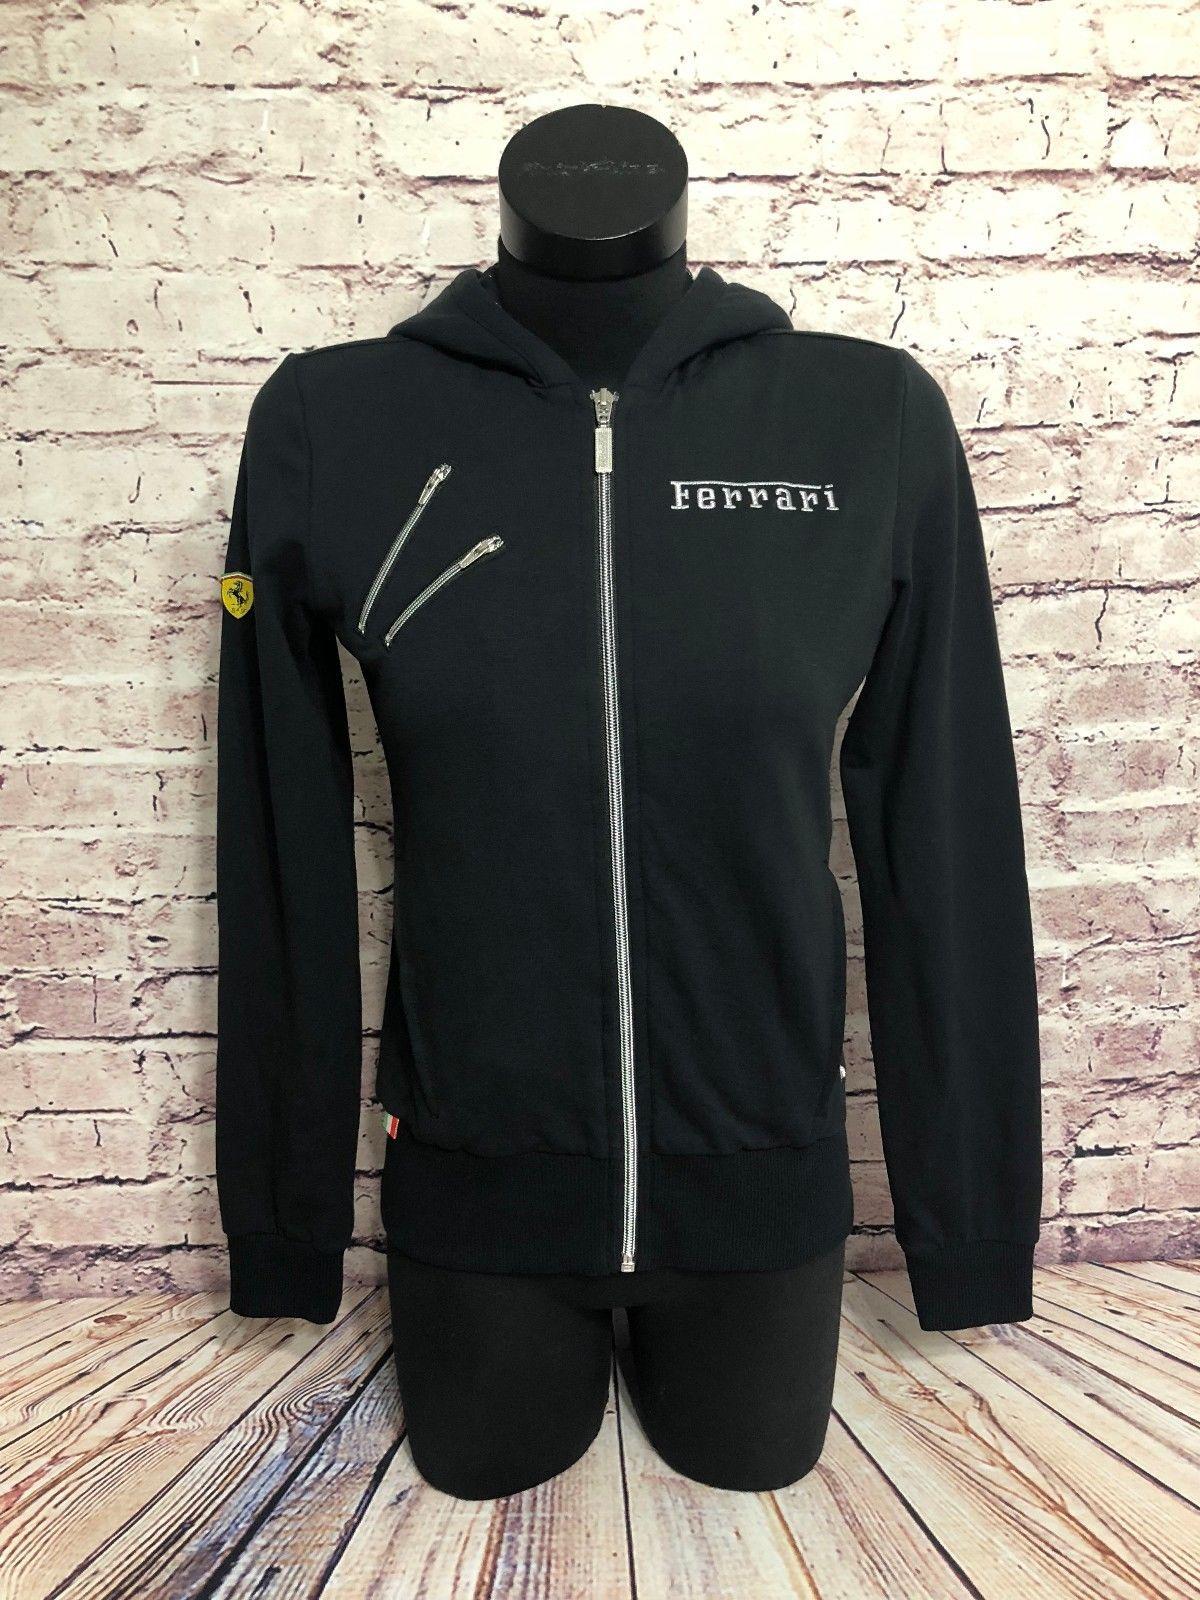 437499179716 Ferrari Scuderia Puma Womens Black Sport Lifestyle Hooded Zip Up Track  Jacket S